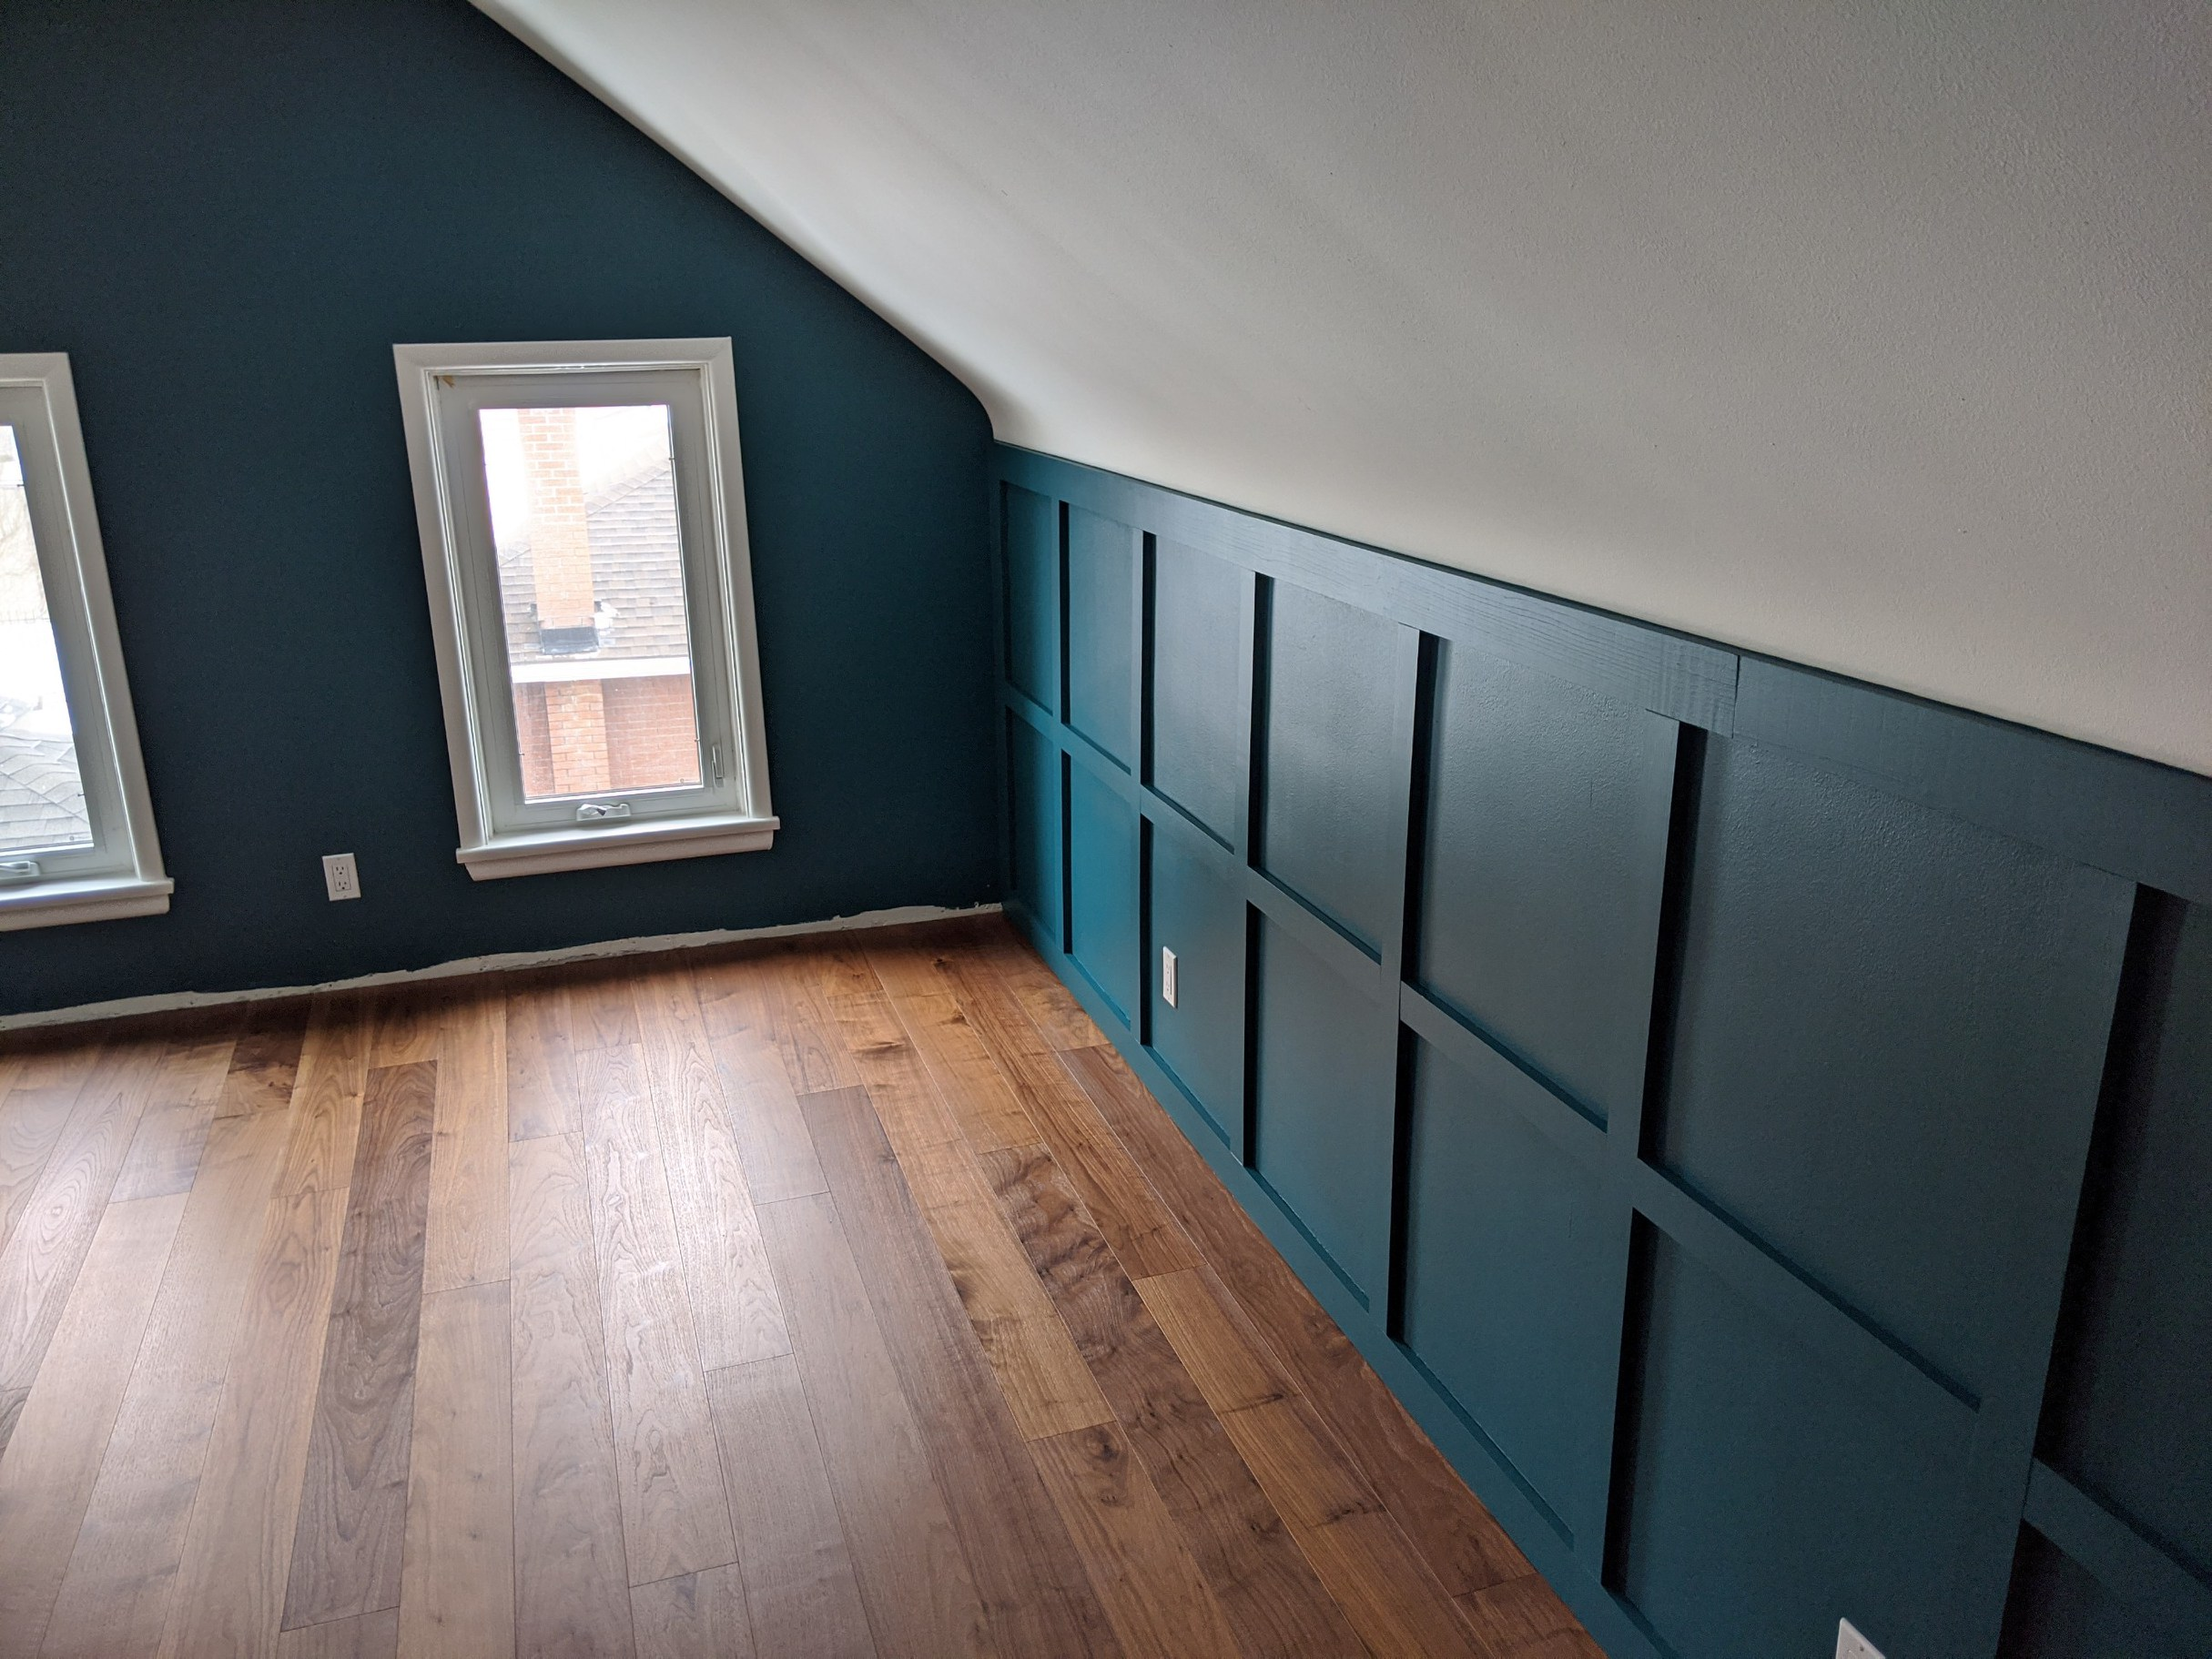 angled ceilings, teal painted walls and hardwood floor